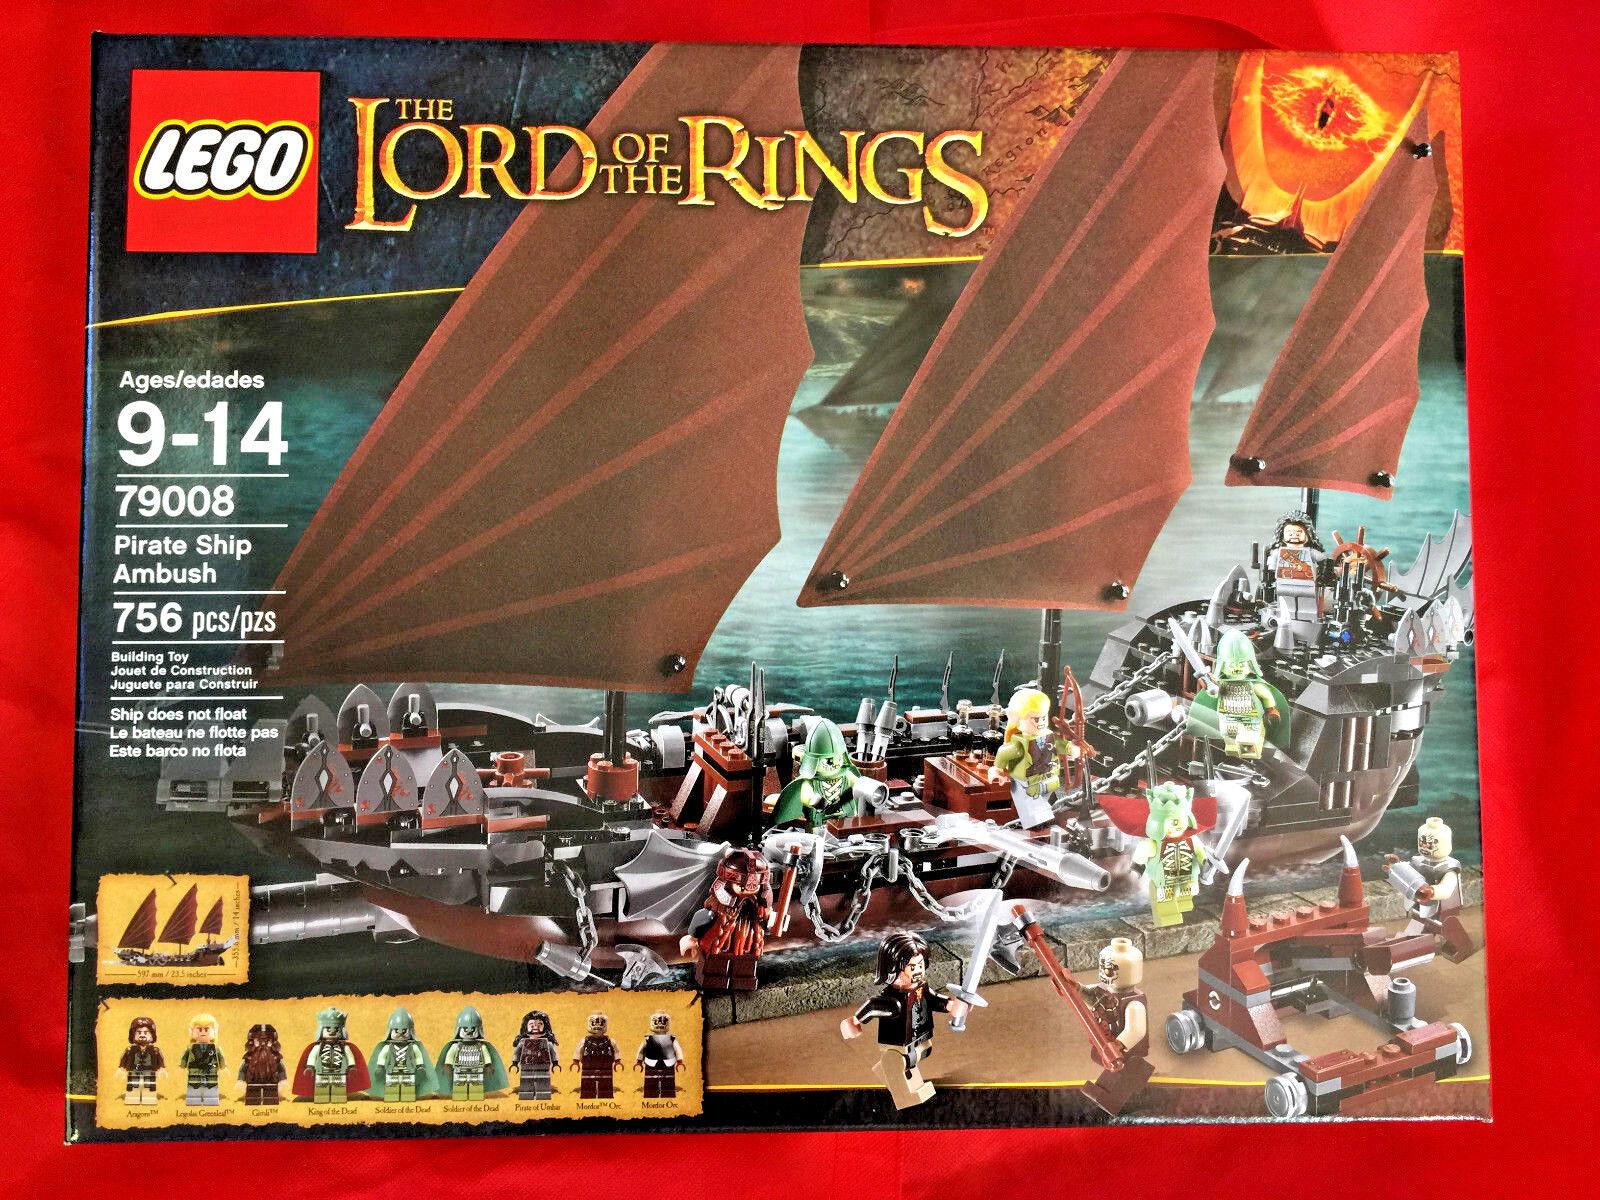 LEGO LORD of the RINGS LOTR PIRATE SHIP AMBUSH 79008 New Sealed RETIROT